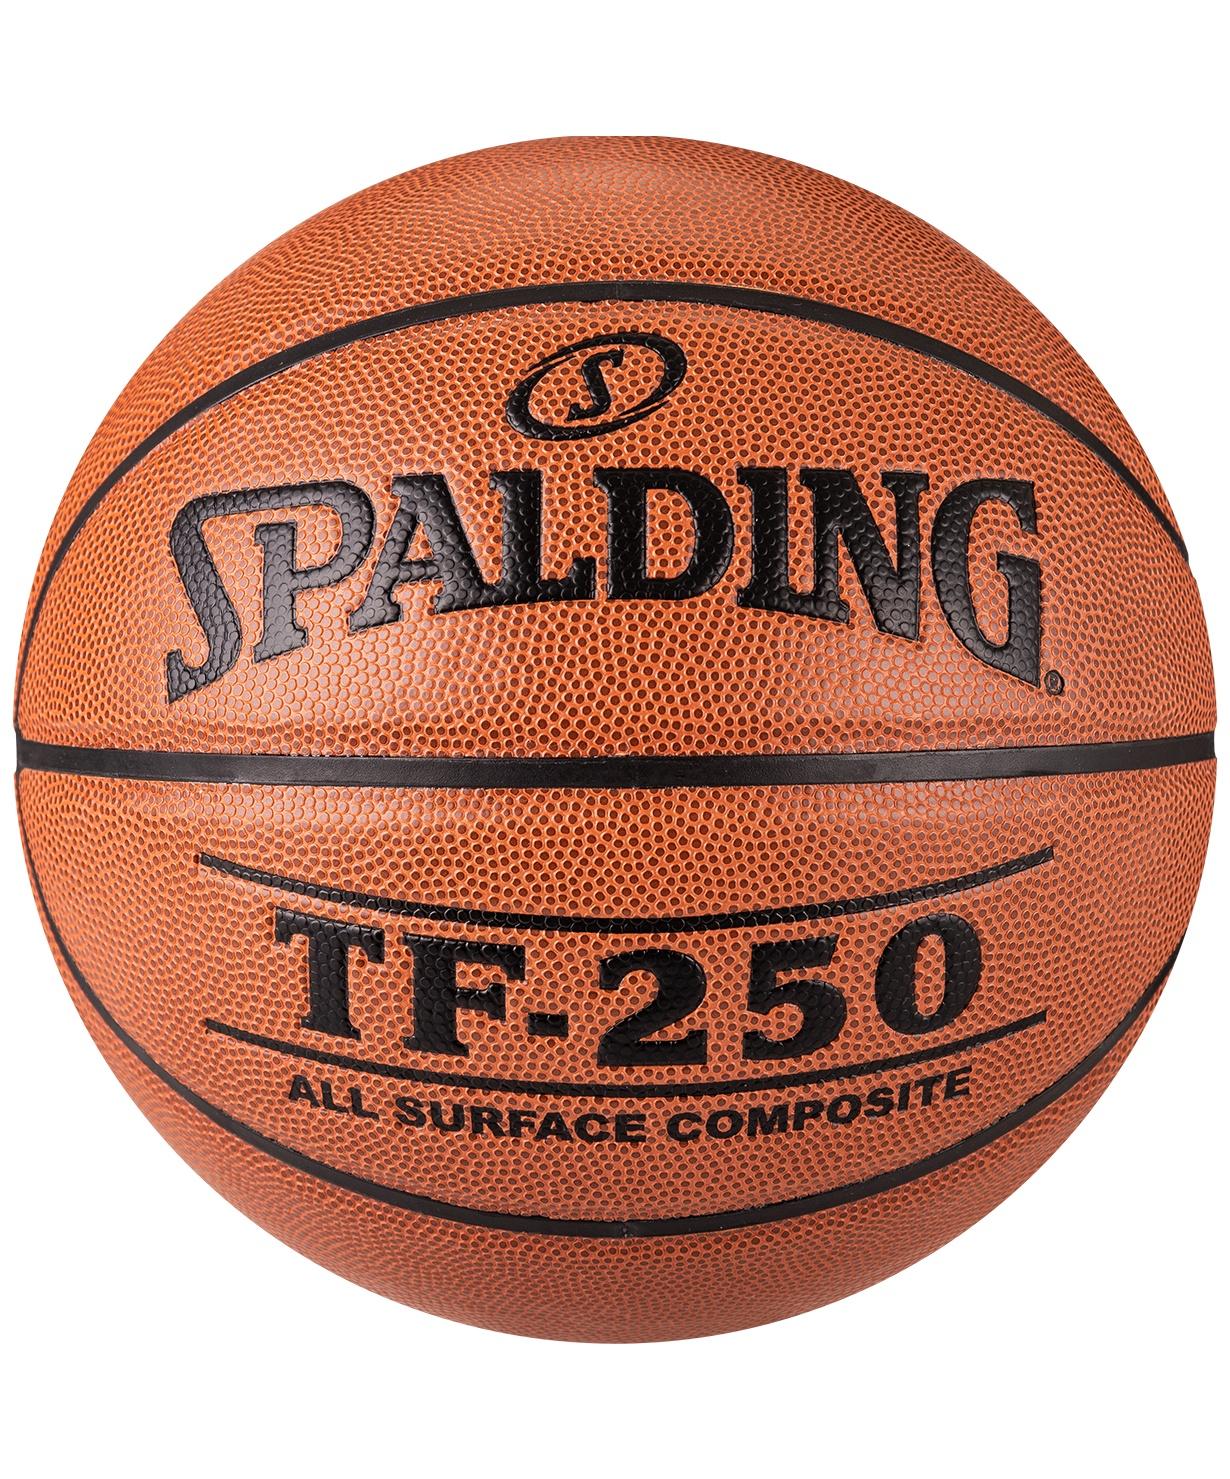 все цены на Мяч баскетбольный Spalding TF-250, Размер 6 (74-532) (6) онлайн